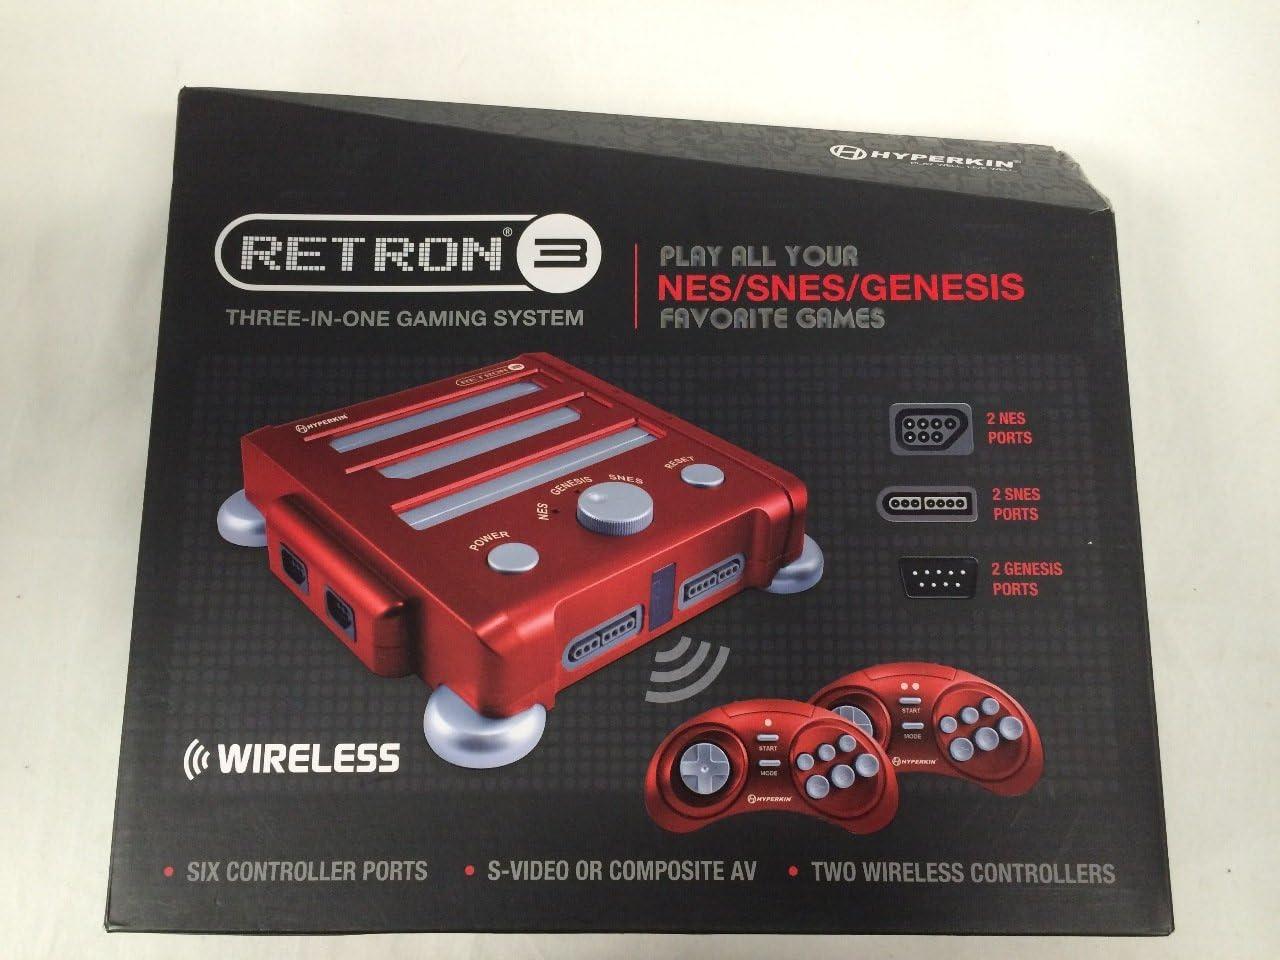 Amazon.com: Hyperkin Retron 3 Video Game System for NES/SNES ...